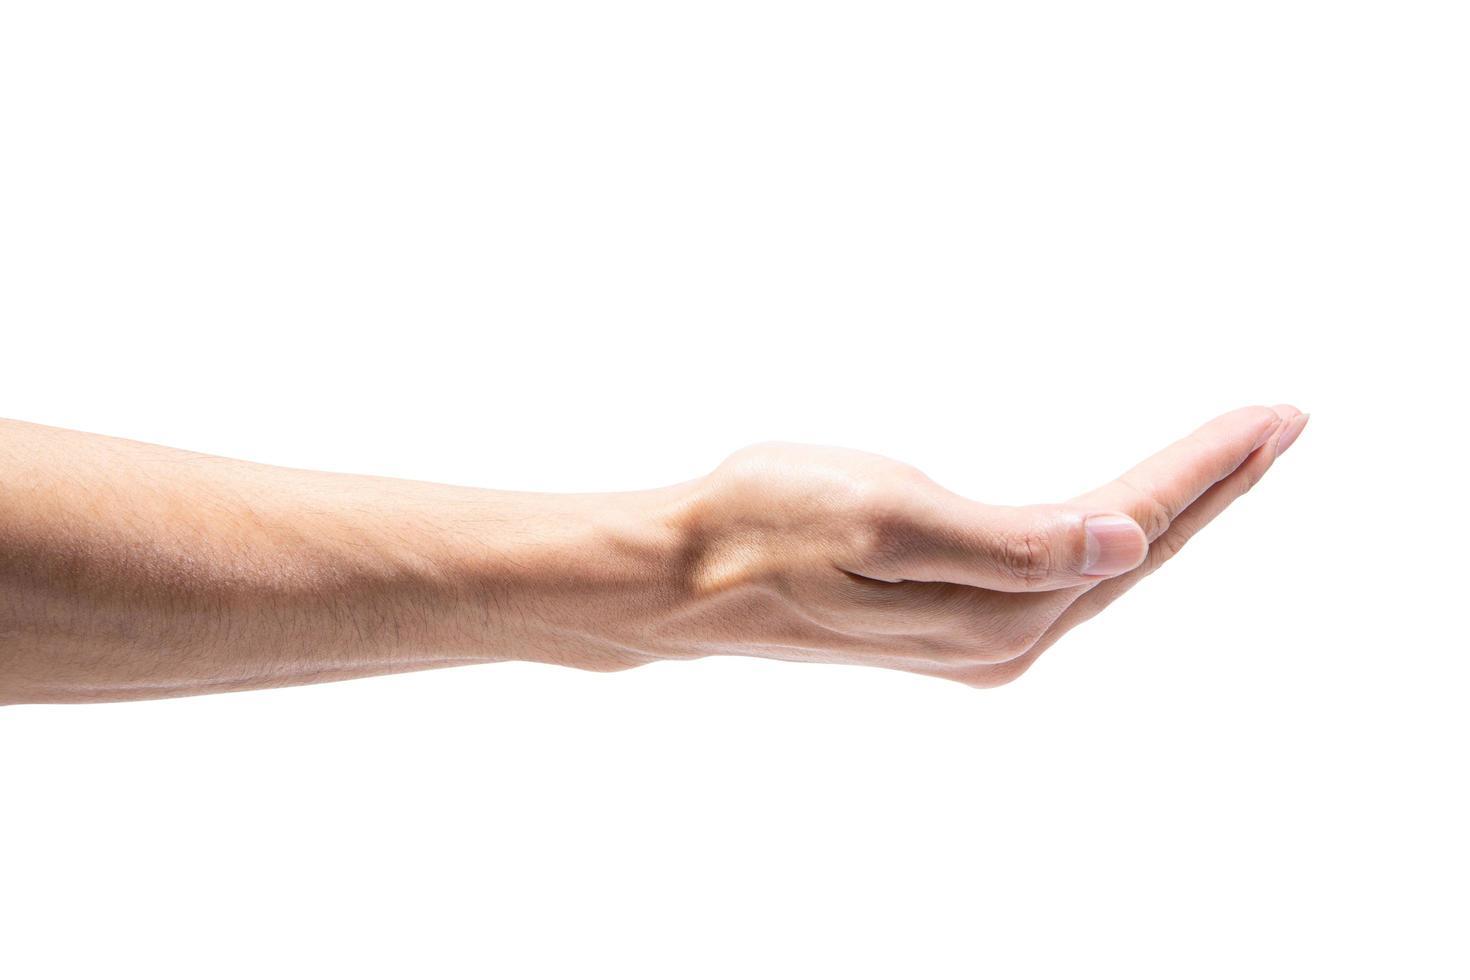 Hand on white background photo